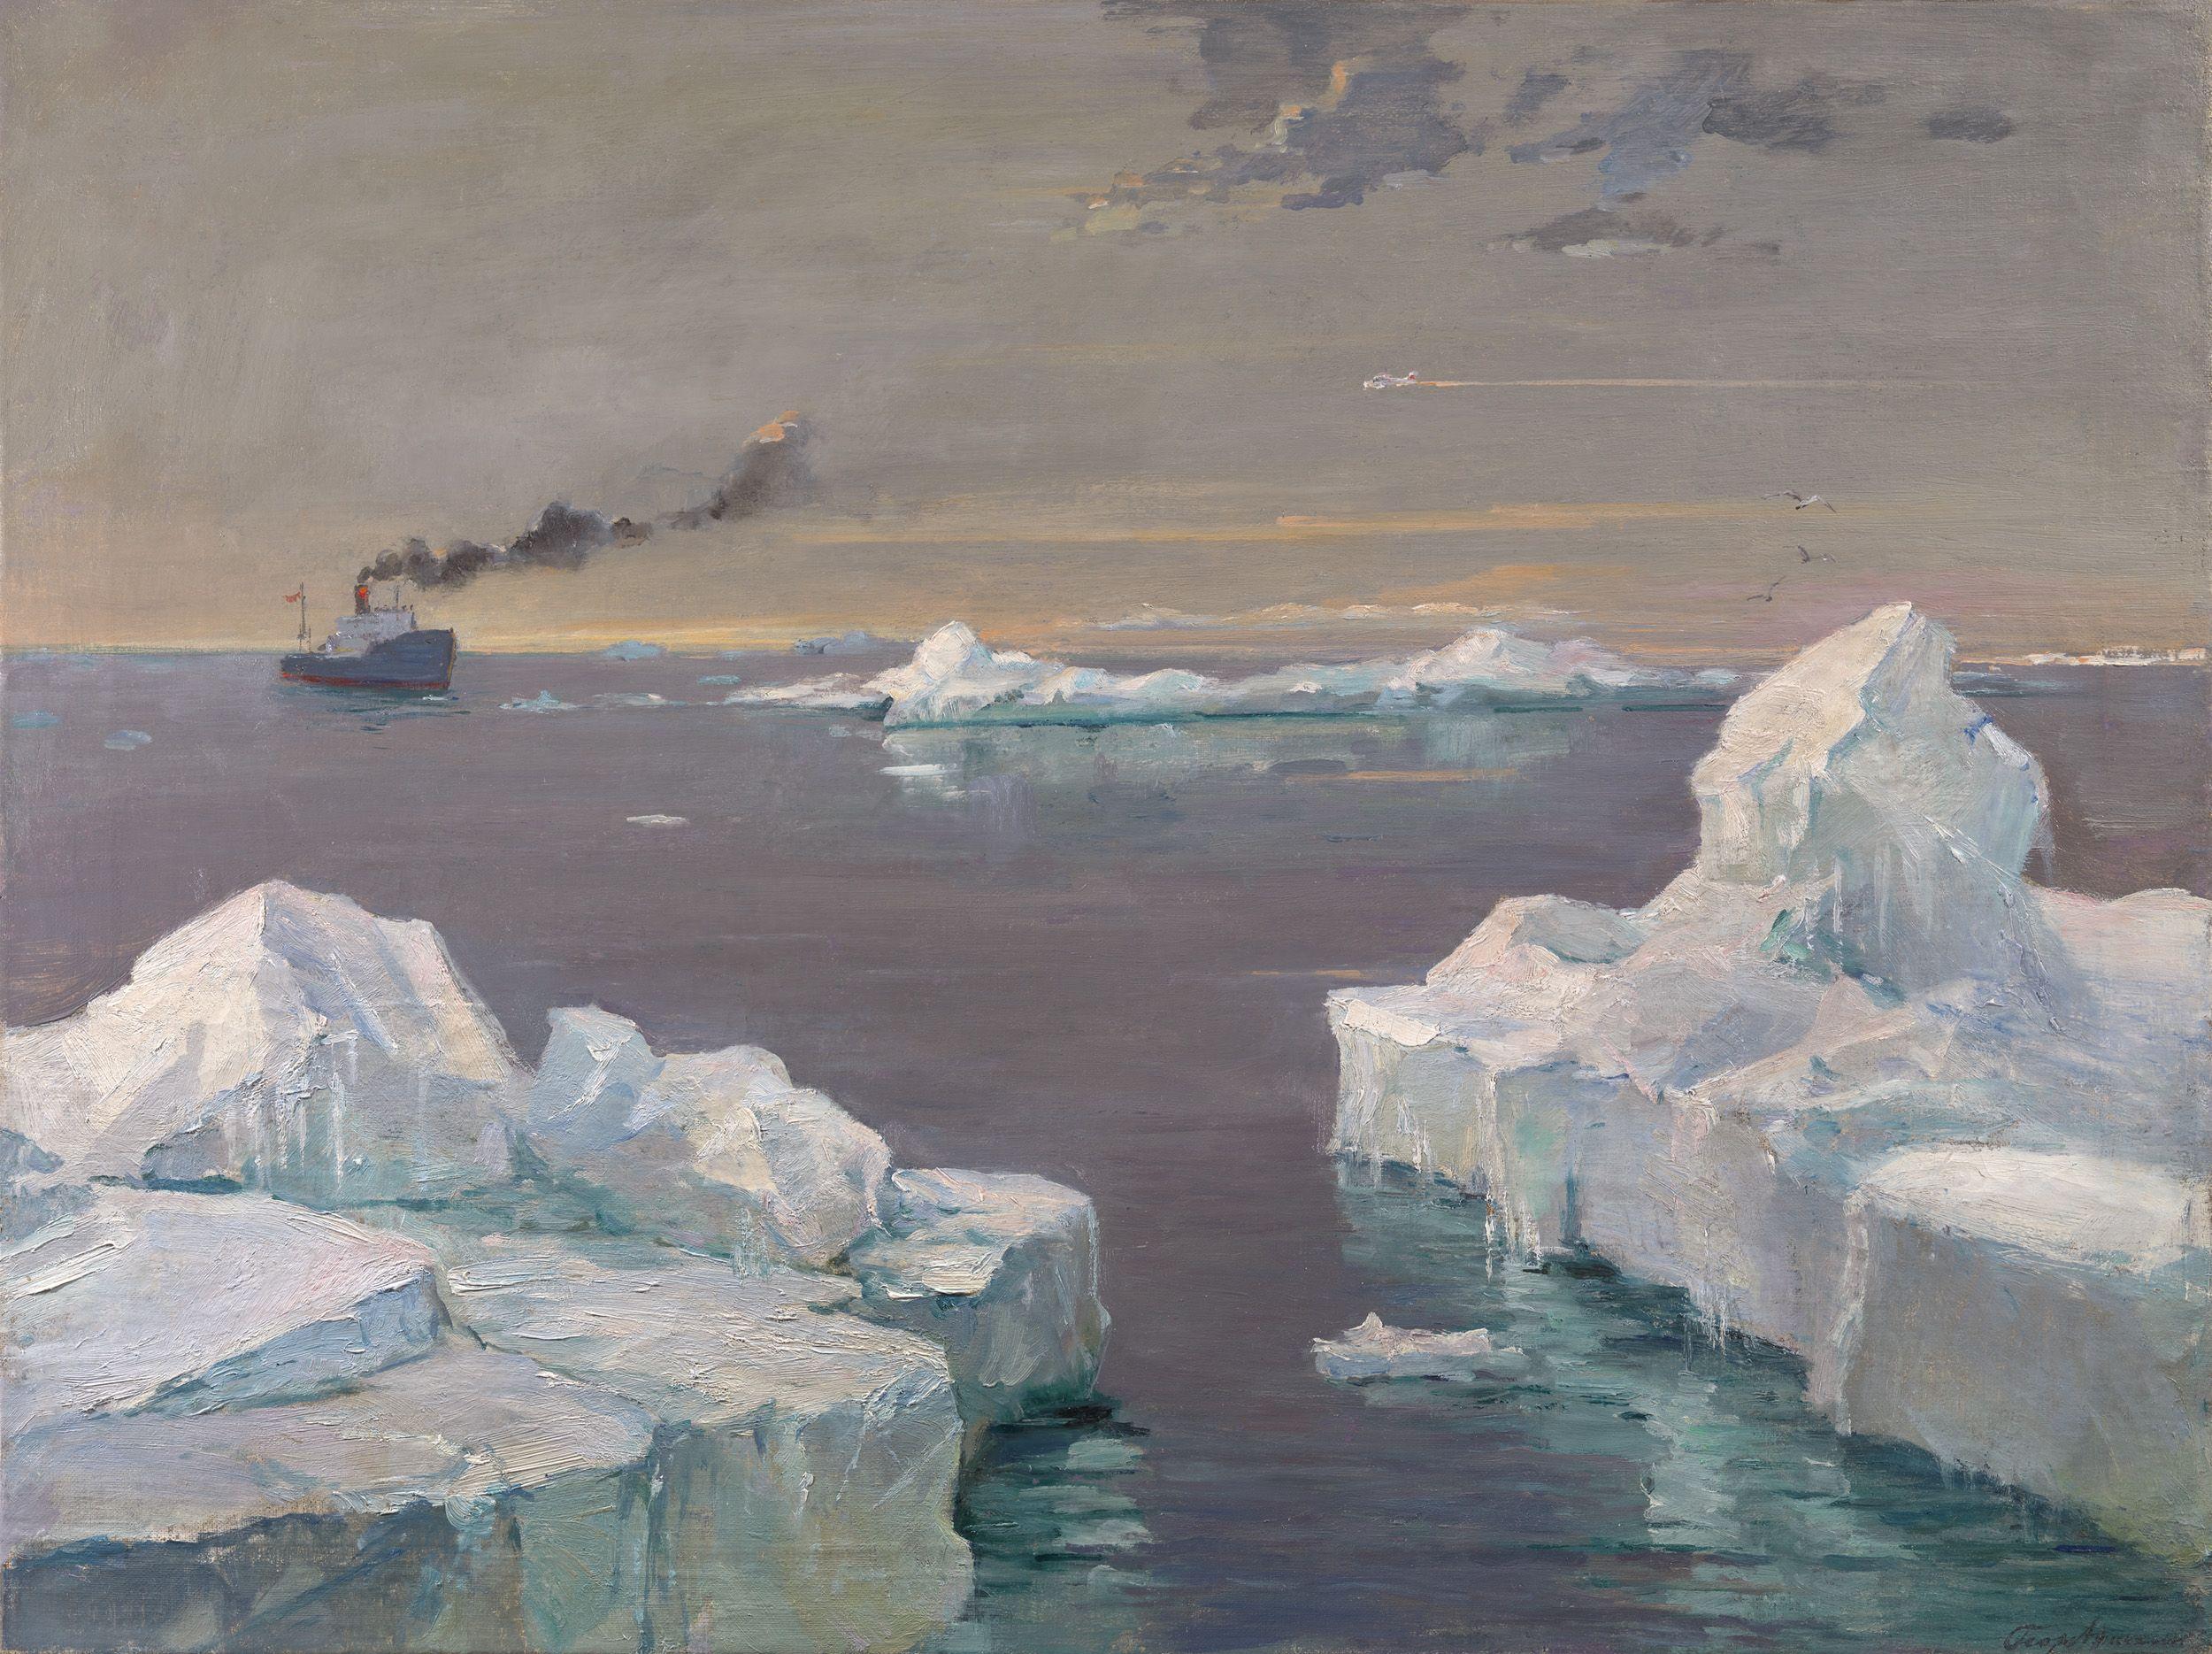 Lot 23, Georgy Nissky, Icebergs